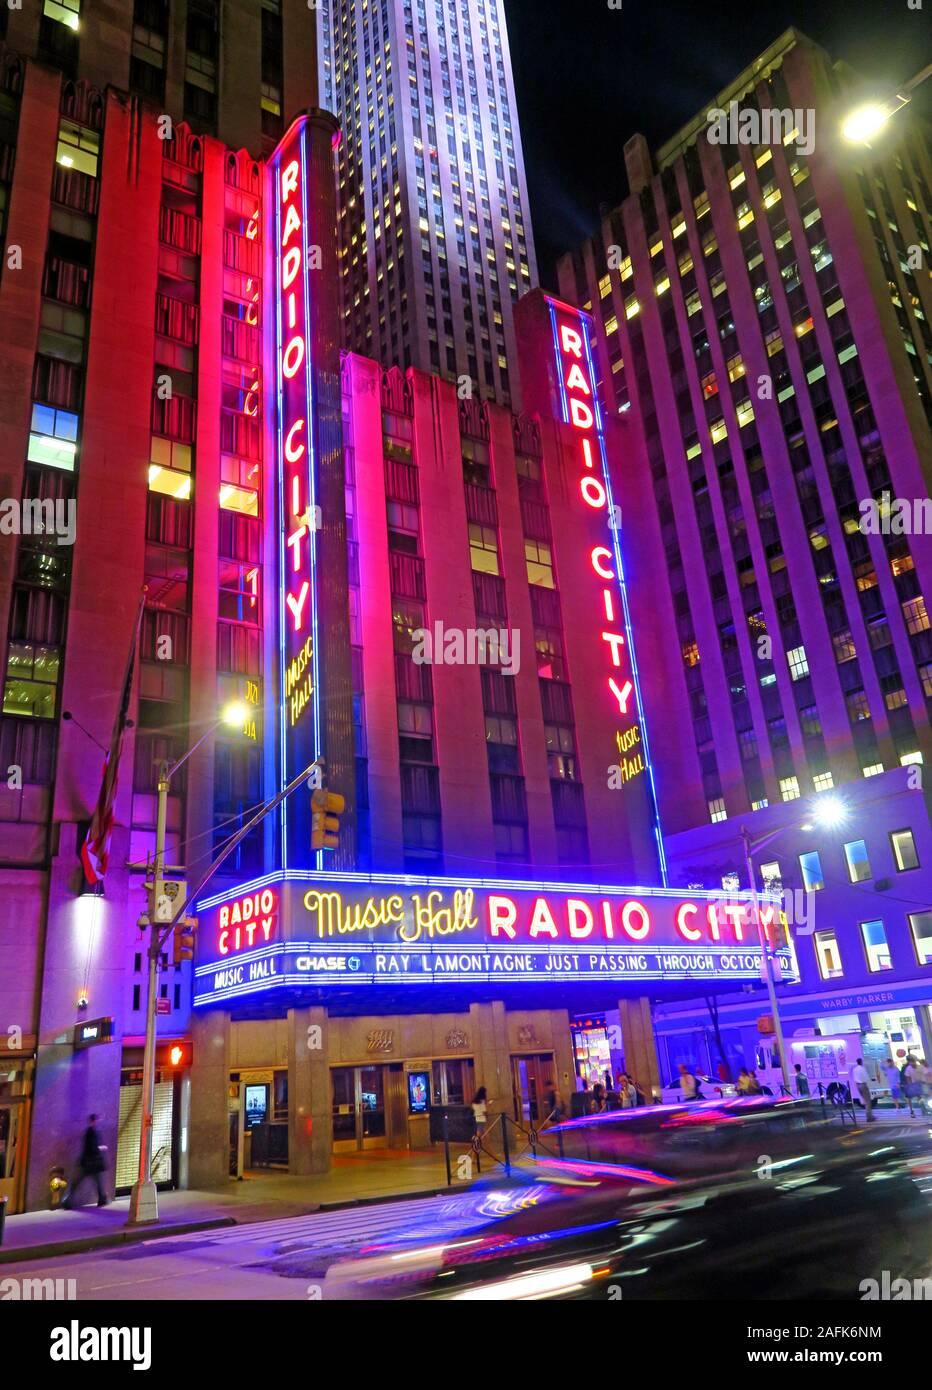 HotpixUK,@HotpixUk,GoTonySmith,NYC,NY,New York,Manhattan,USA,city,city centre,US,venue,performance,at night,night,evening,nighttime,neon,lights,neon lights,Art Deco style,Art Deco,style,Radio City,New York City Landmark,landmark,Samuel Roxy Rothafel,Radio City theater,theater,theatre,architect Edward Durell Stone,architect,Edward Durell Stone,facade,music hall neon,neon lighting,51st Street,51st St